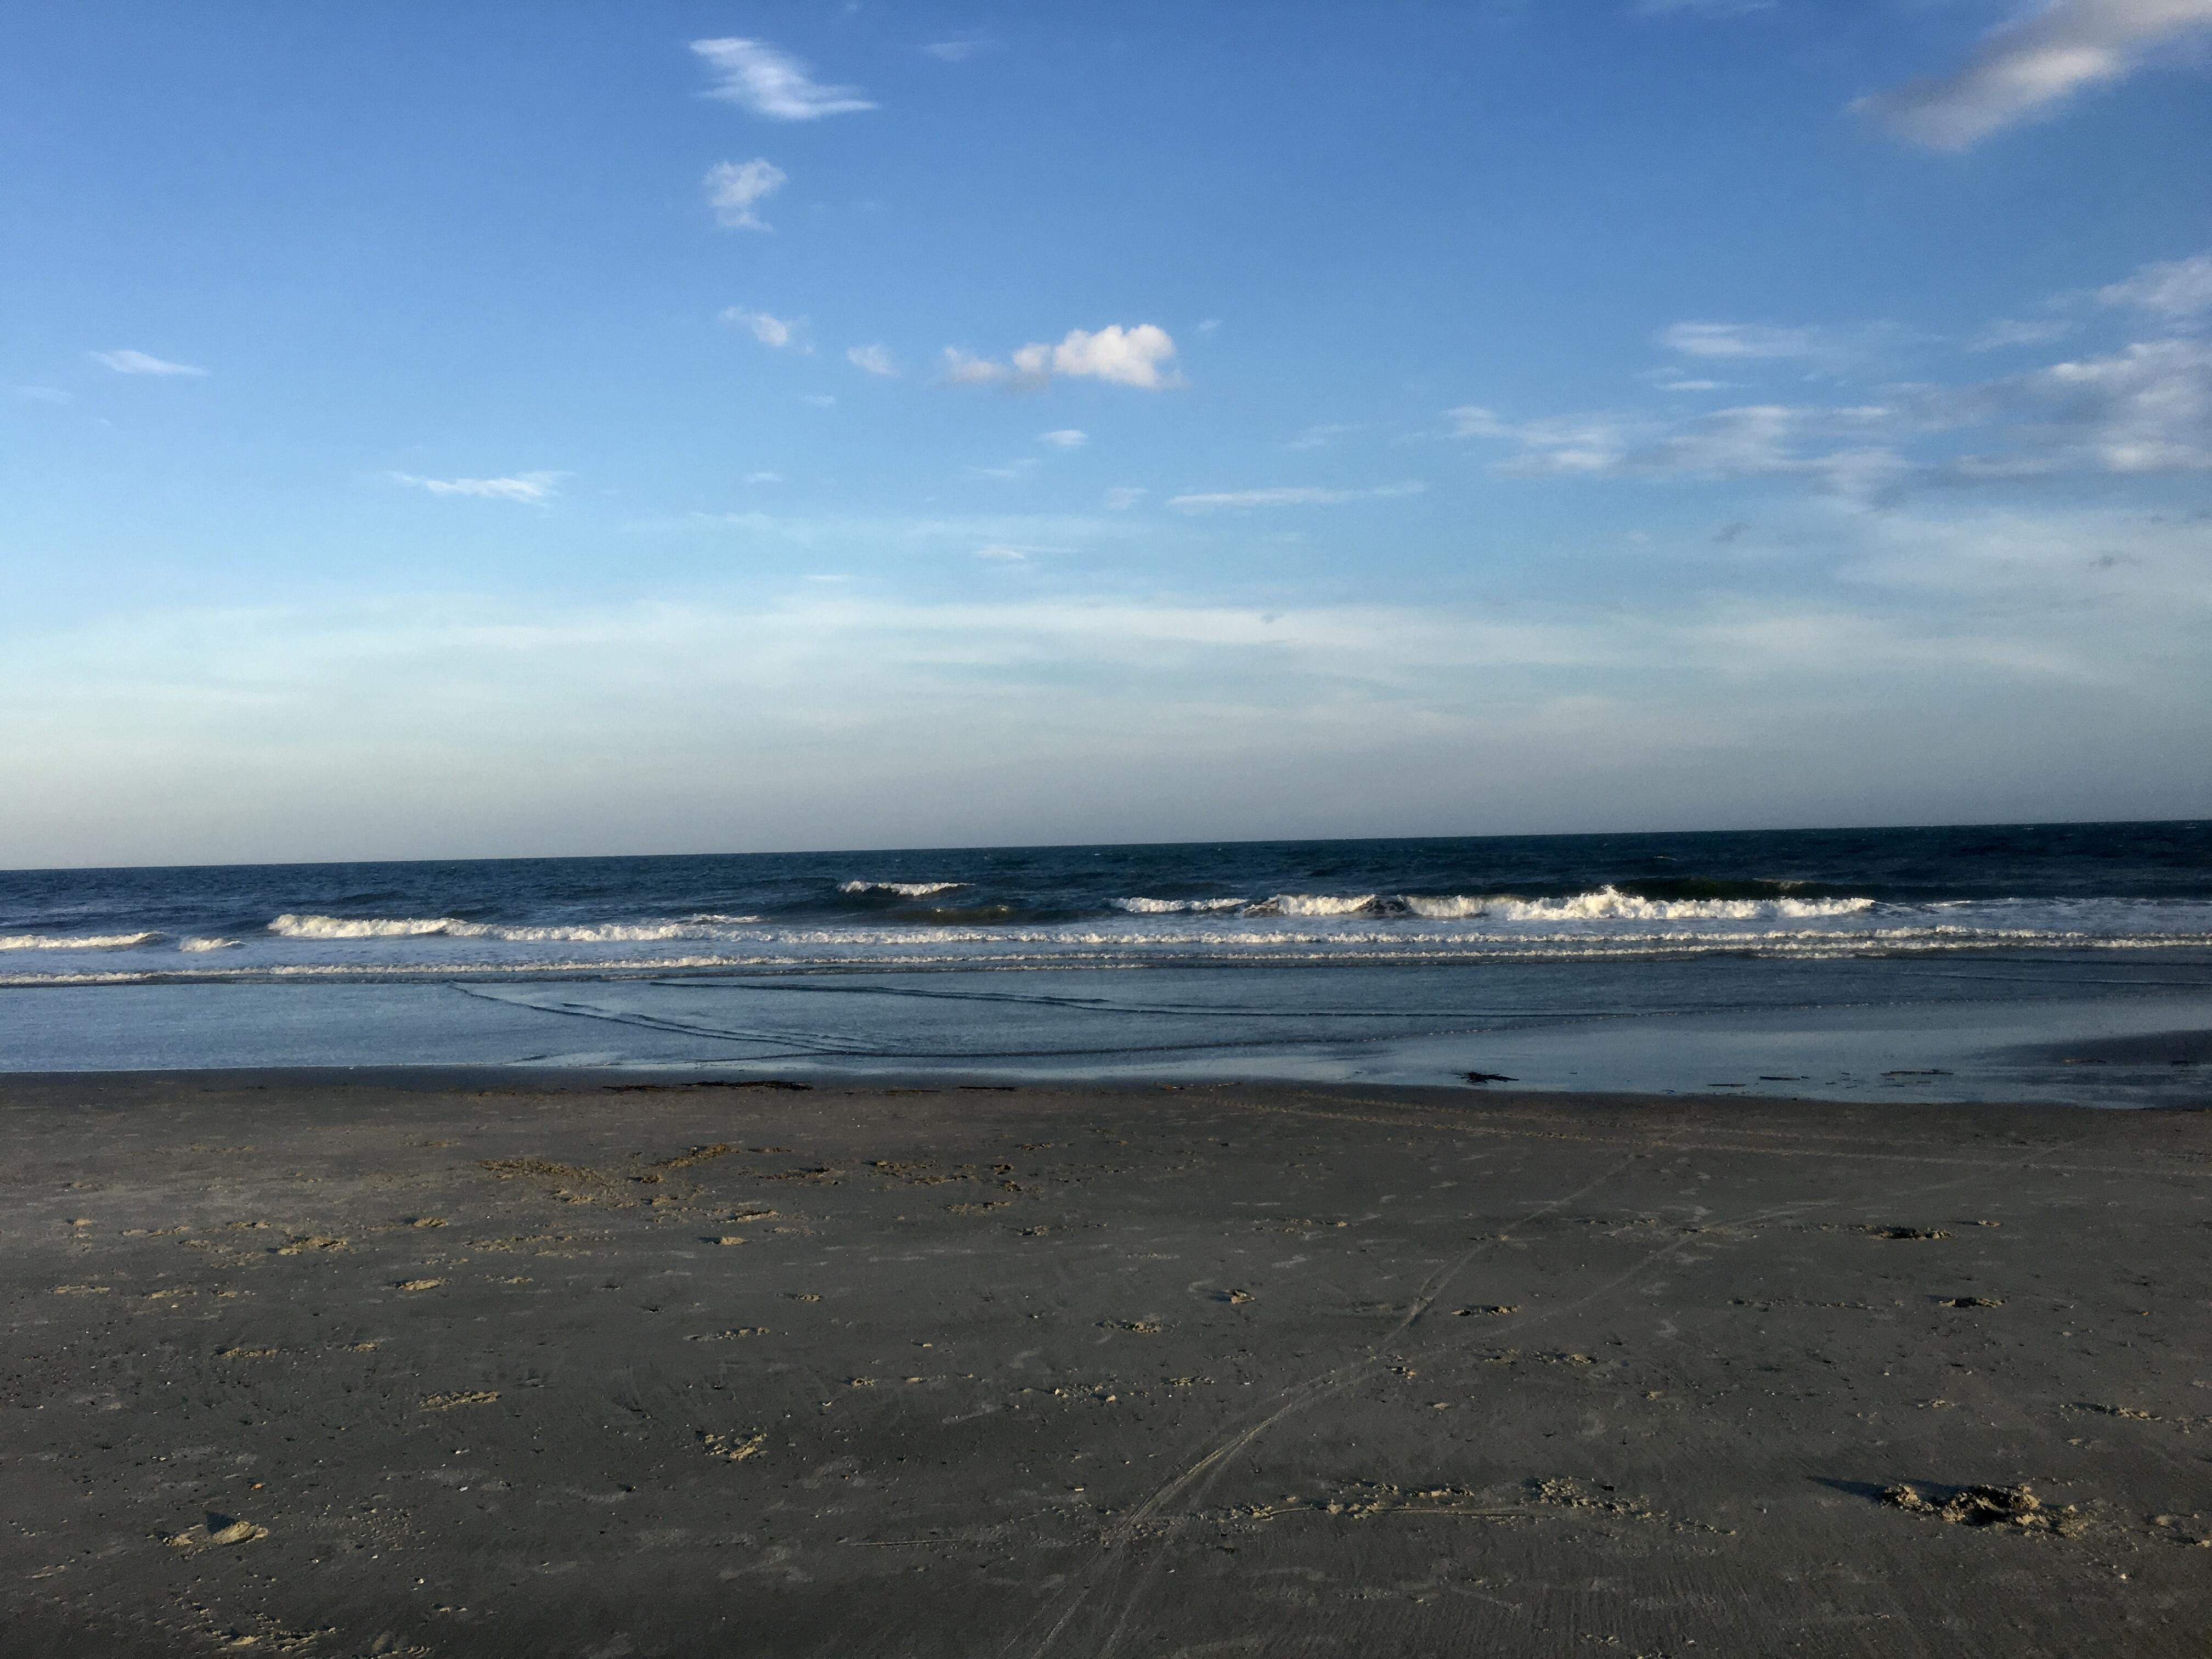 Folly Beach, The Okeanos